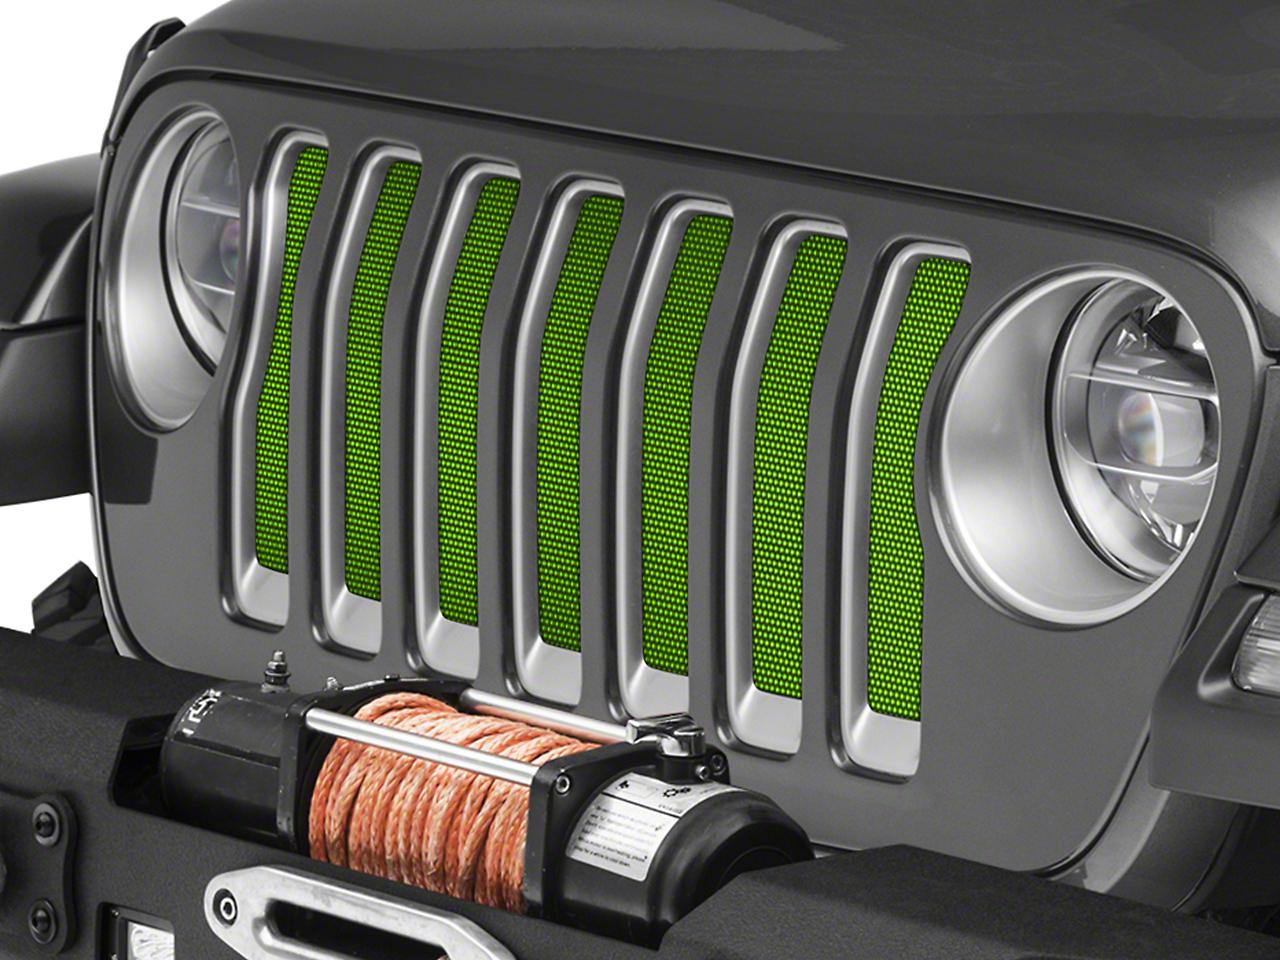 Under the Sun Grille Insert - Gecko (2018 Jeep Wrangler JL)